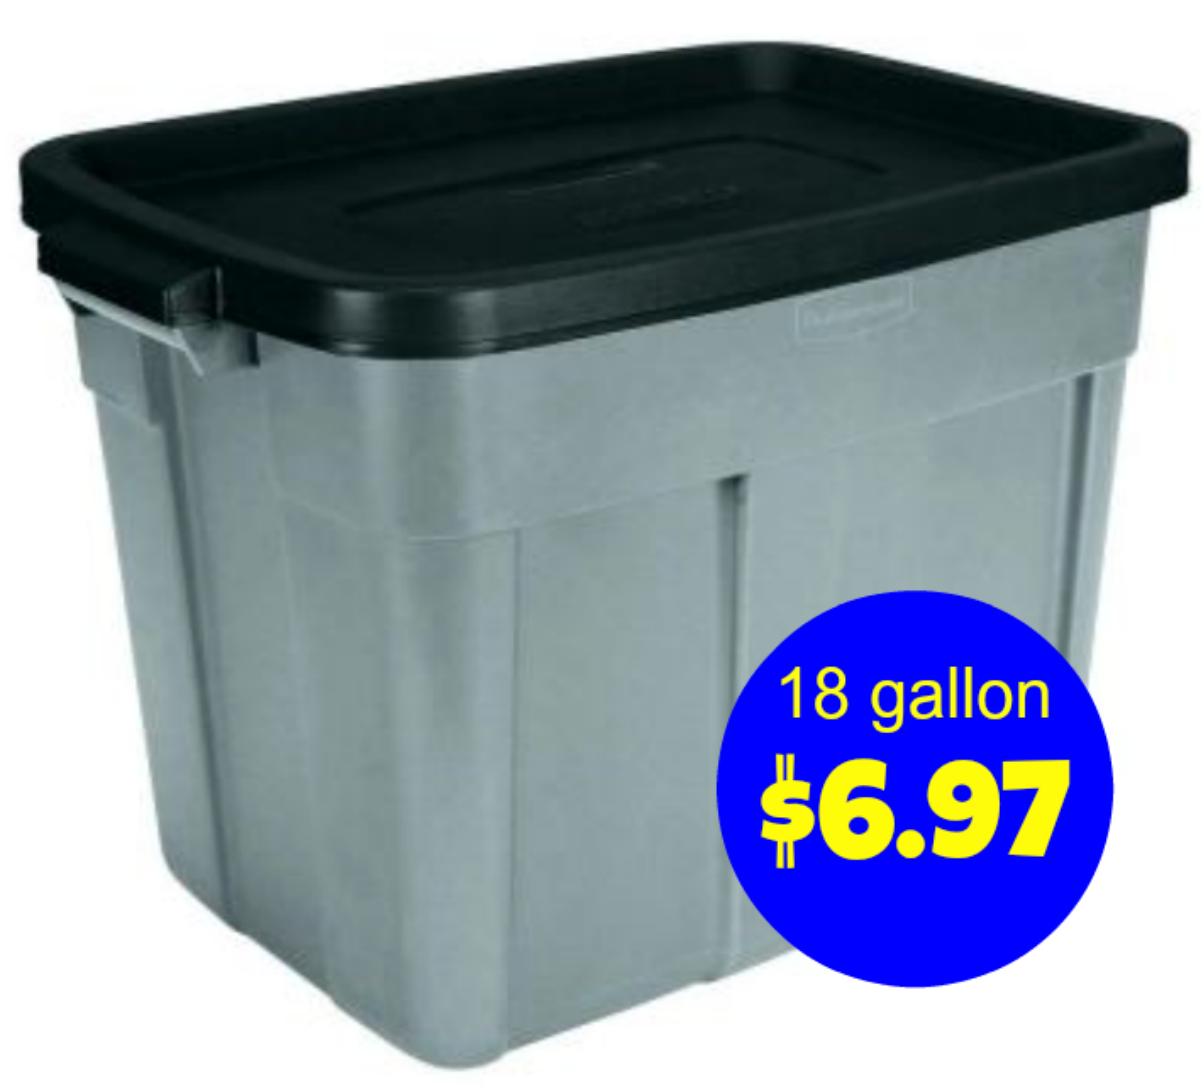 http://www.thebinderladies.com/2014/09/homedepotcom-18-gallon-roughneck.html#.VATI1kvdtbw